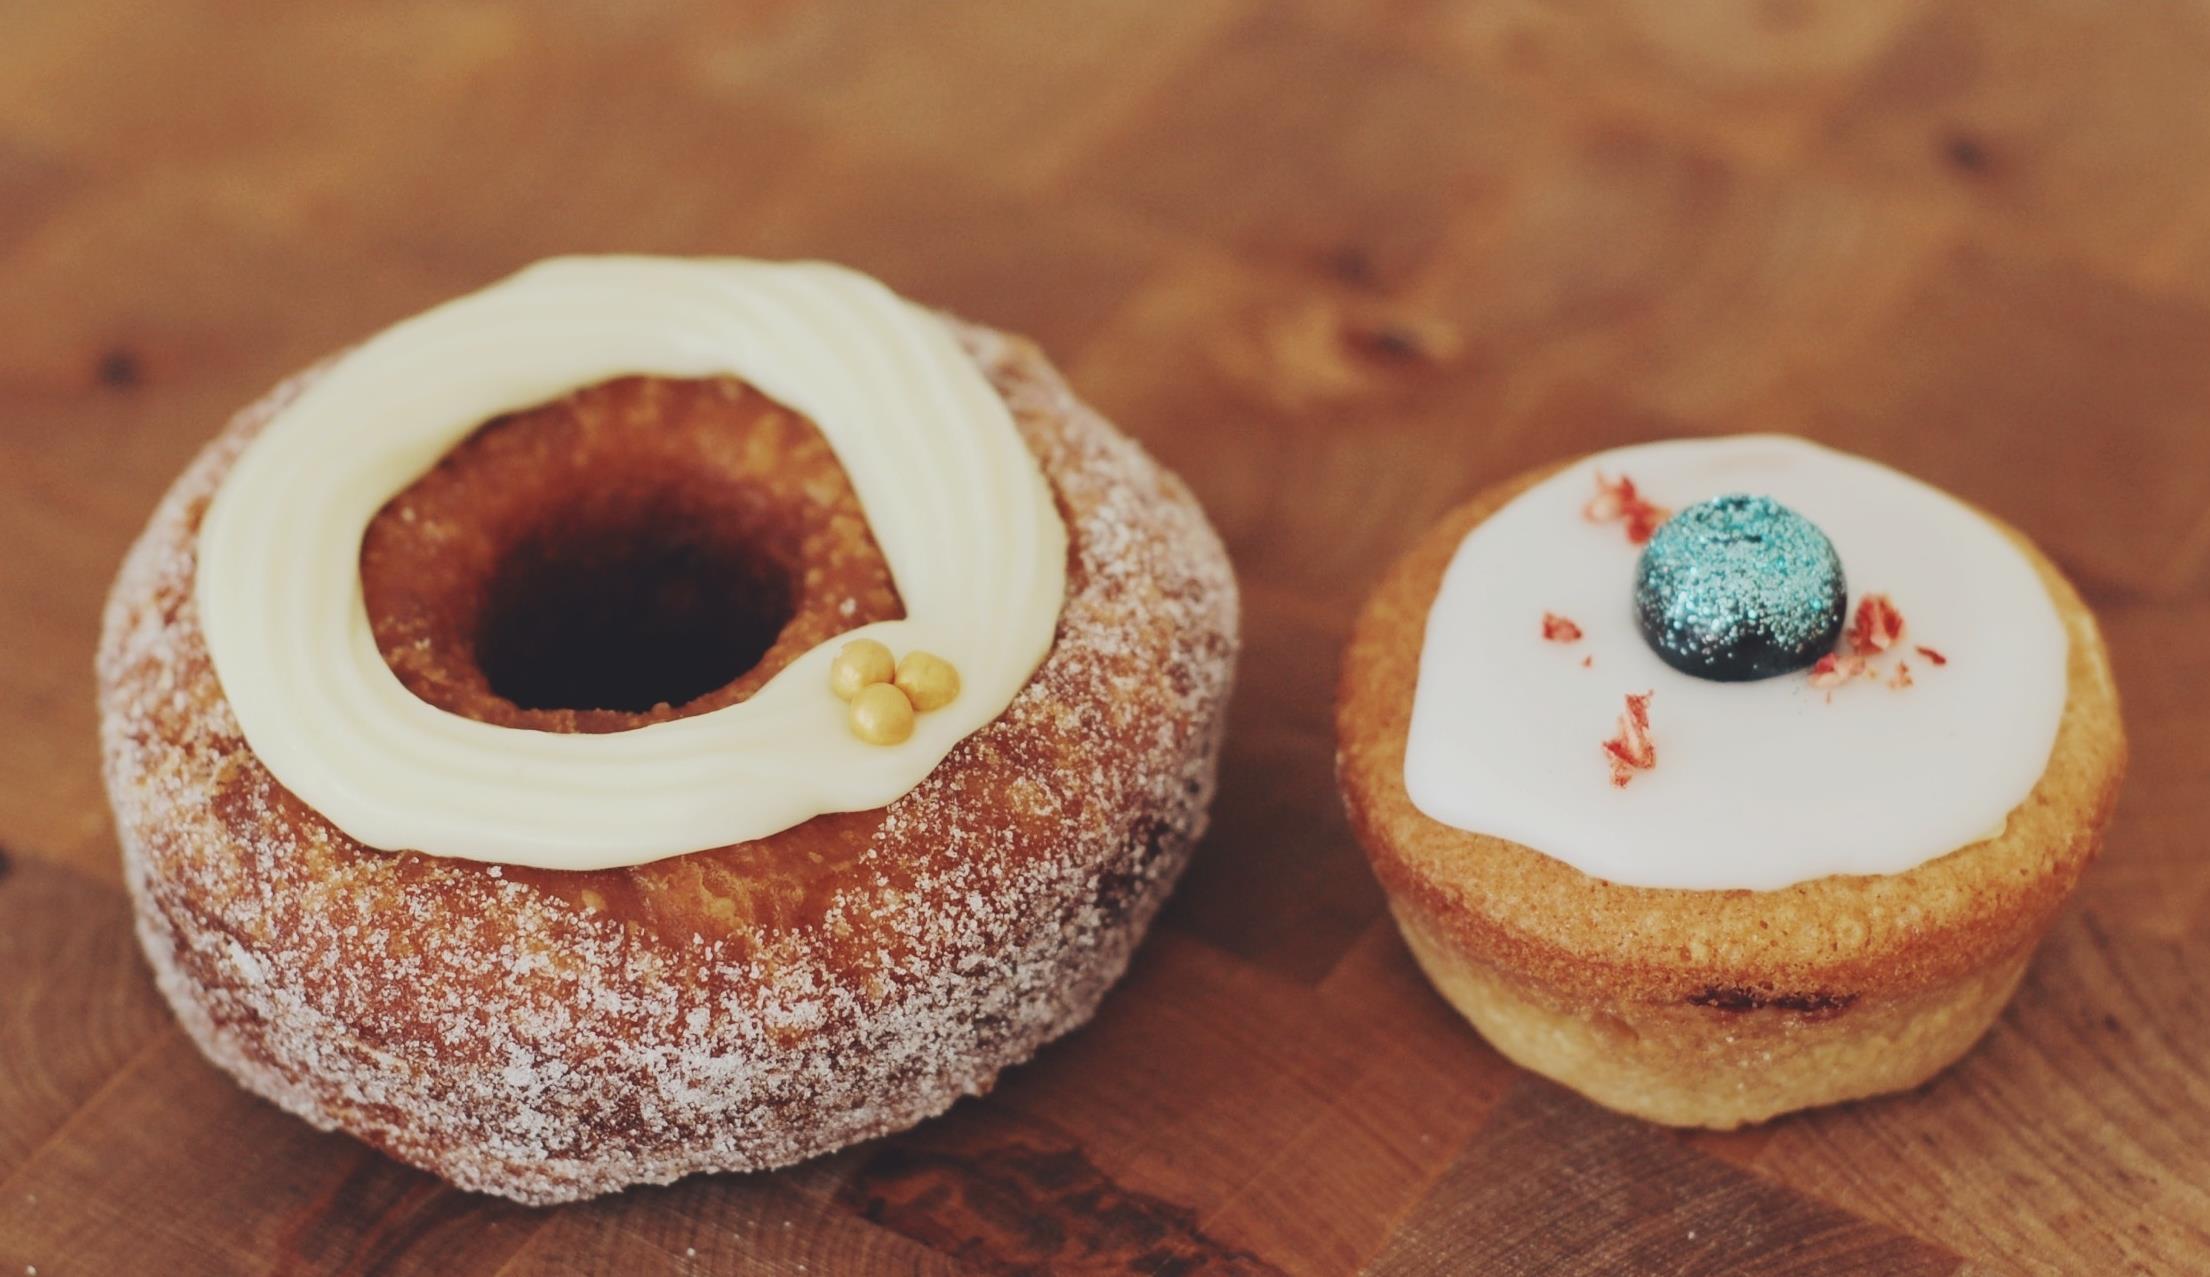 A lemon cronut and a blueberry bakewell walk into a bar...